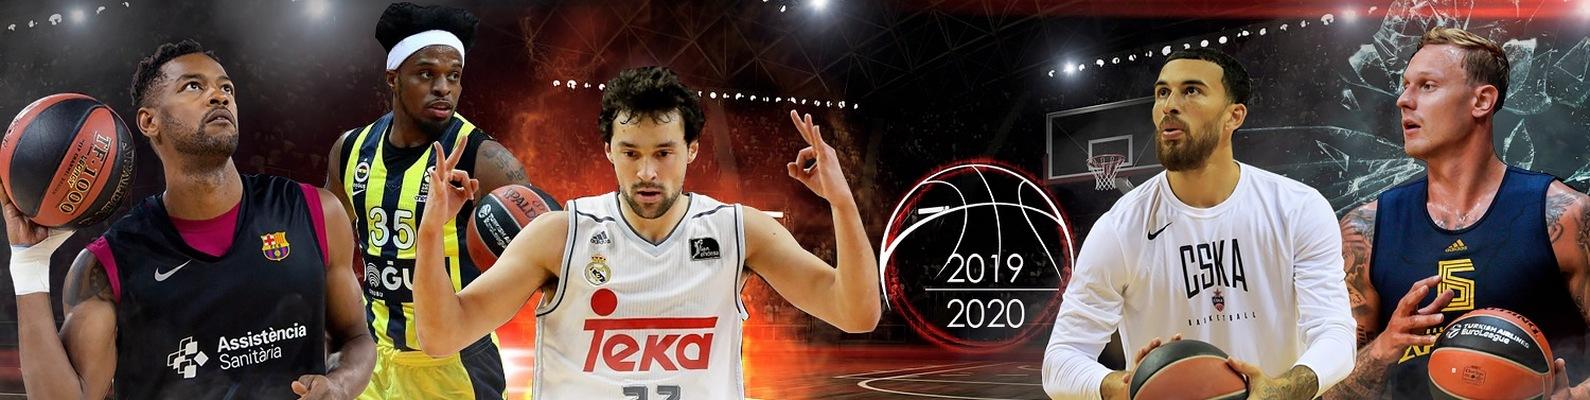 Баскетбол греция россия прогноз на сегодня